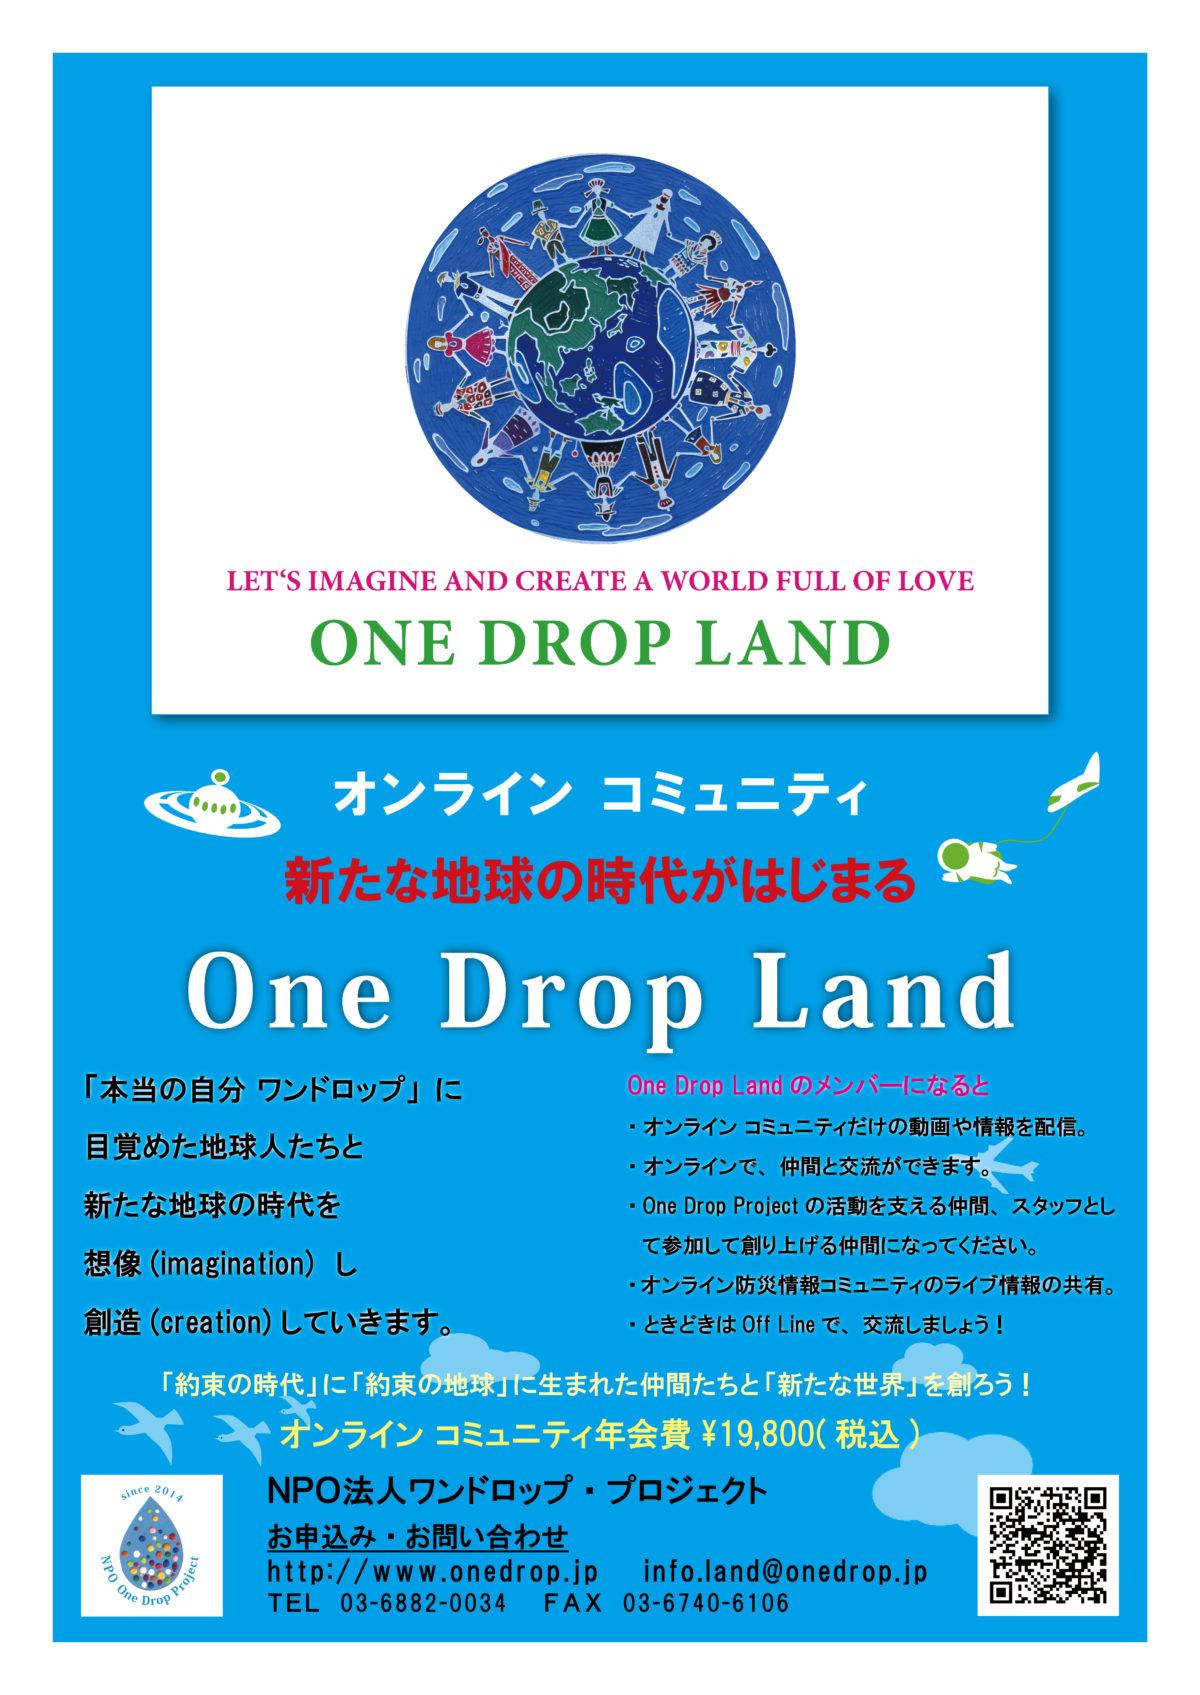 One Drop Land 発足!